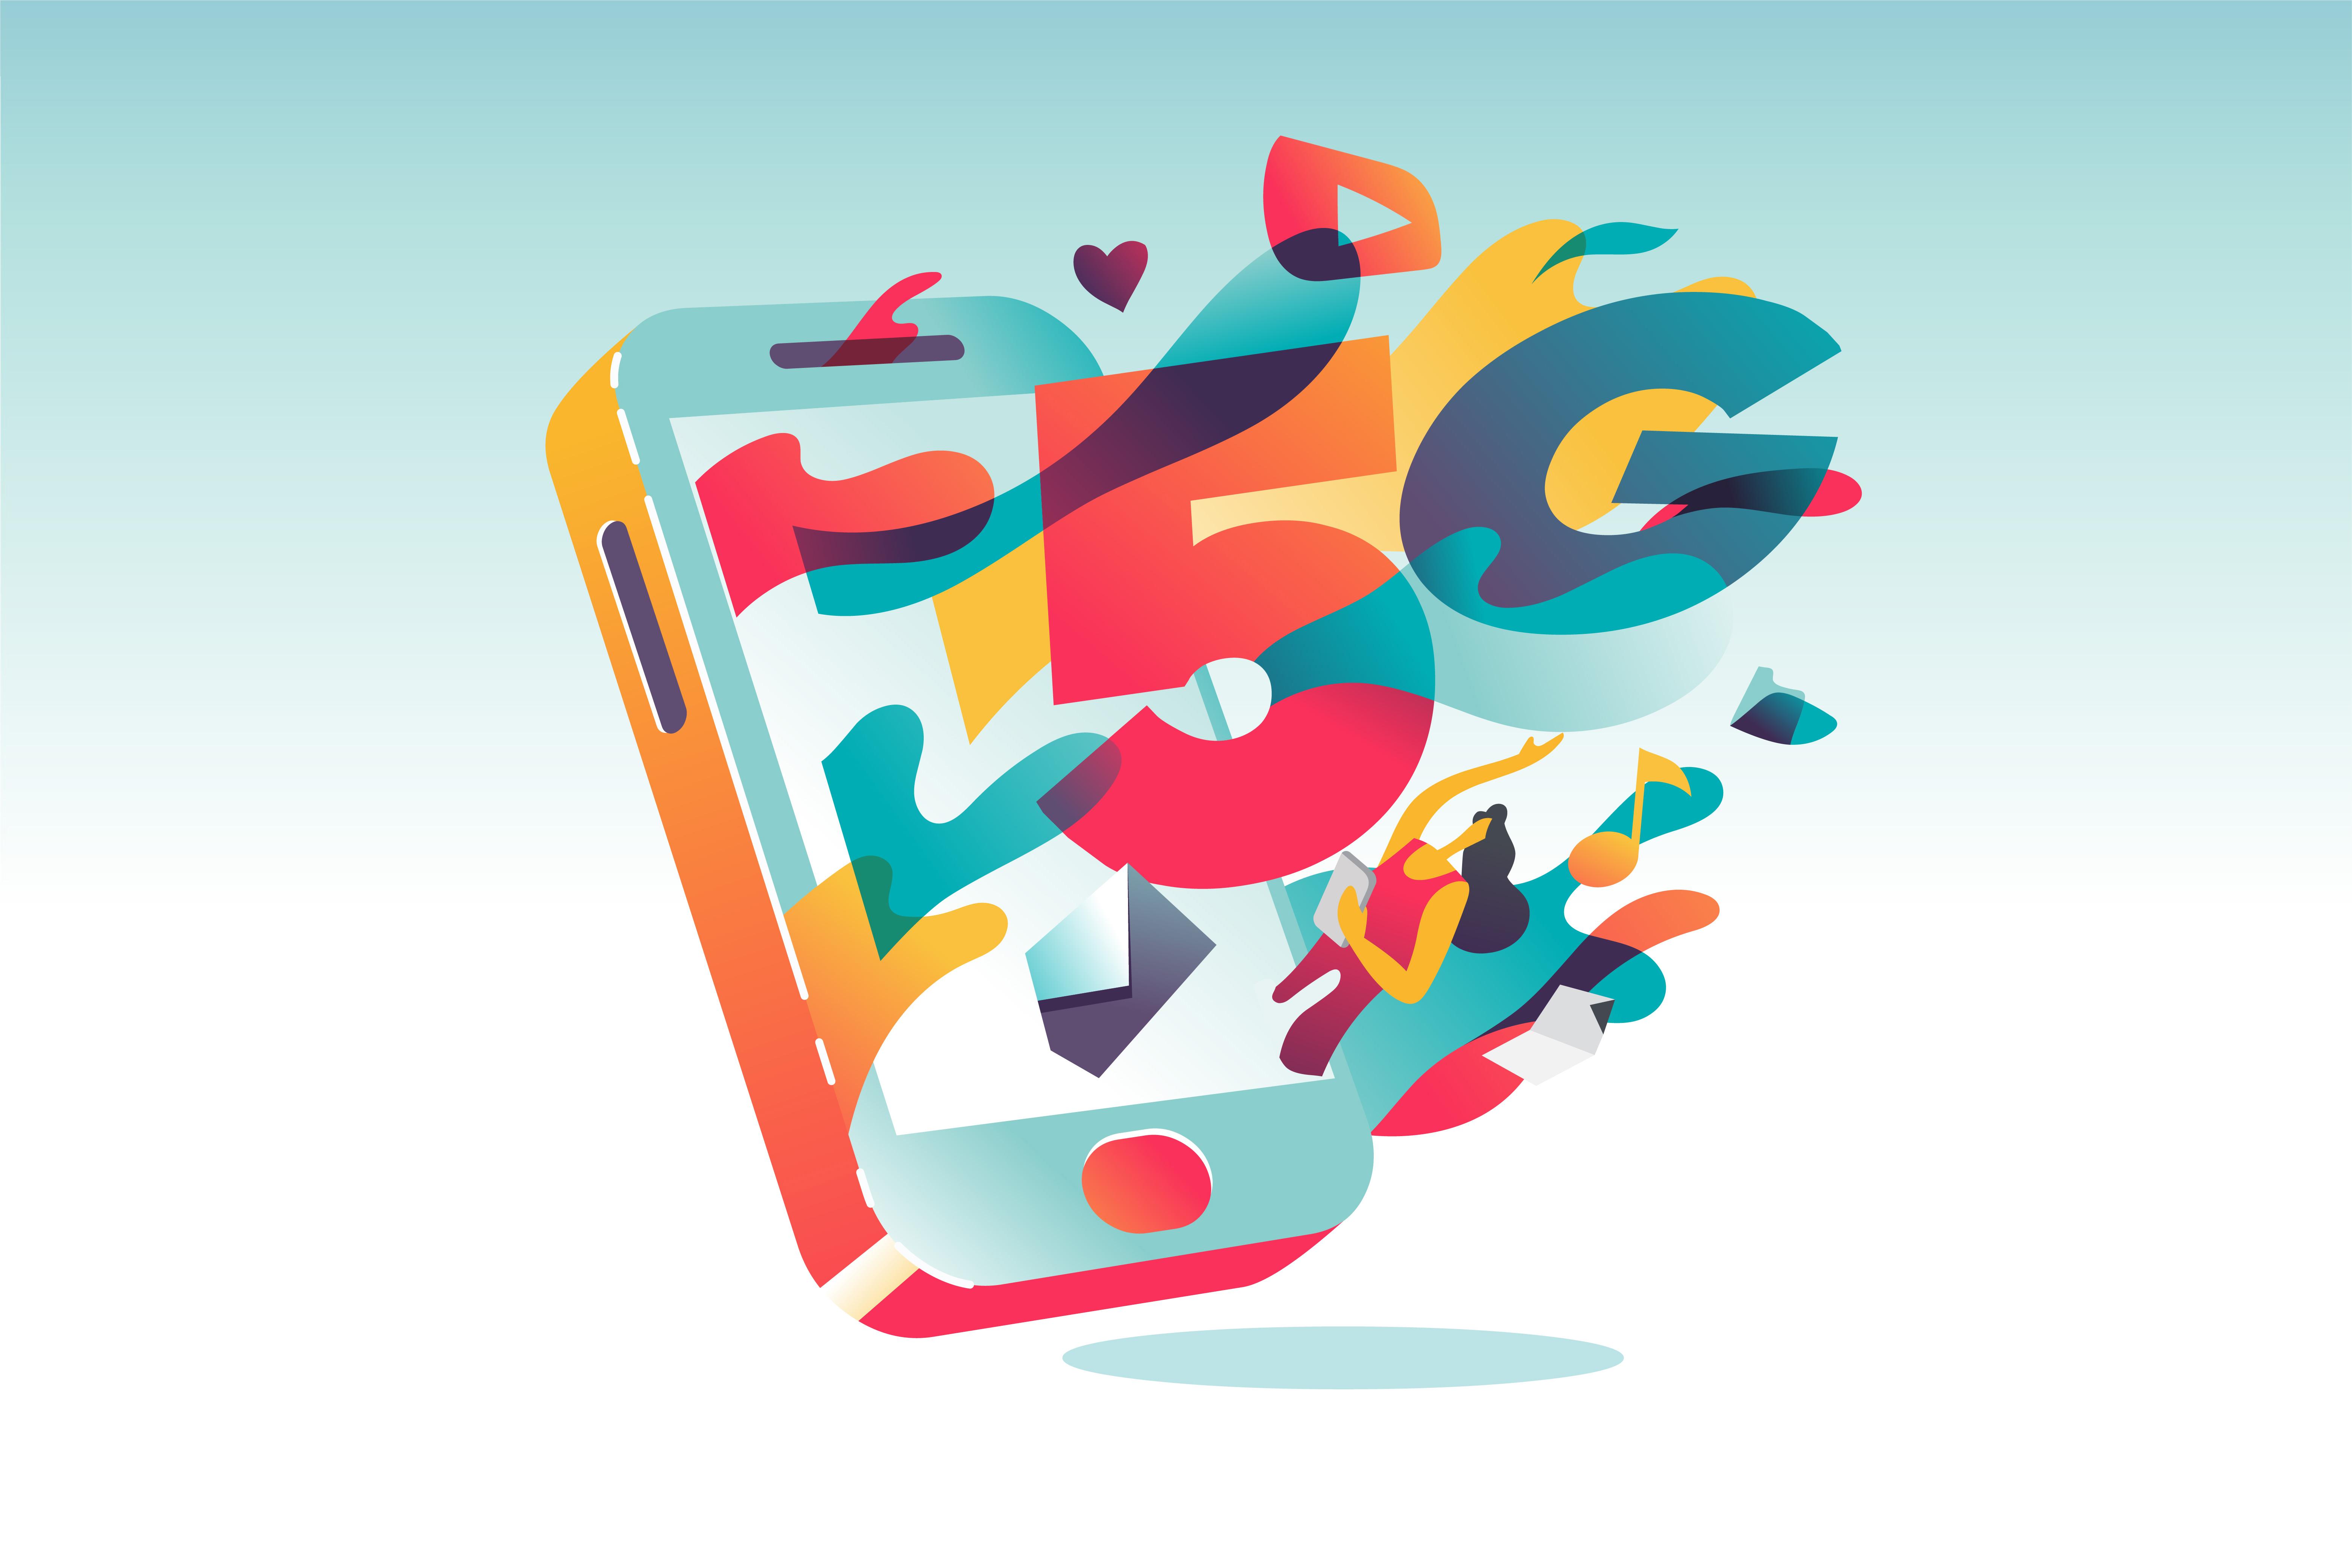 El futuro audiovisual va de la mano del 5G